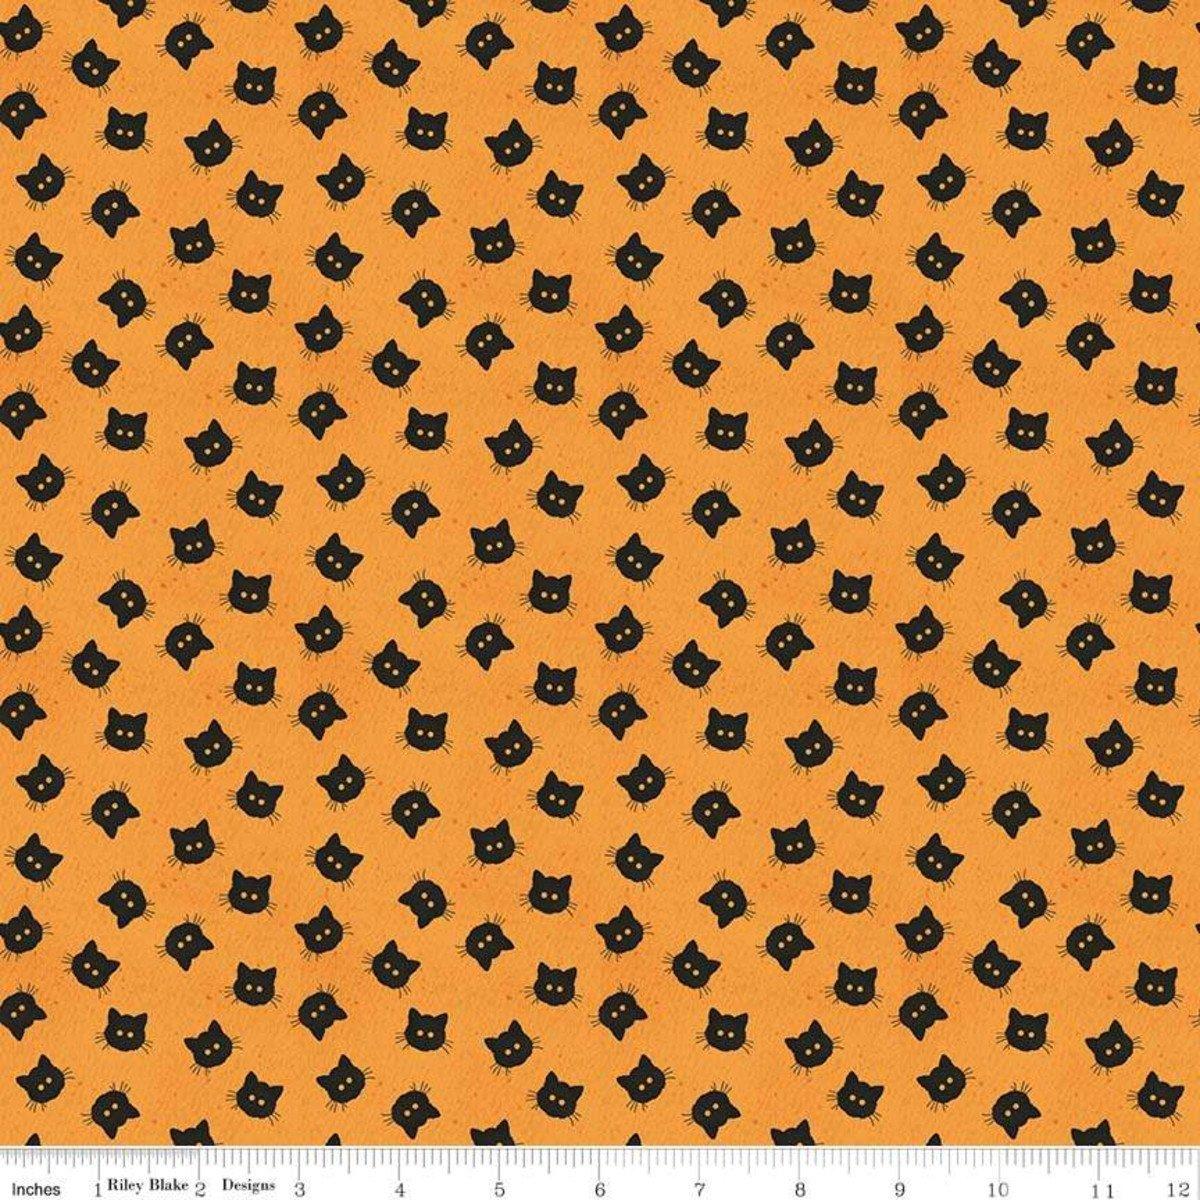 Riley Blake Costume Maker's Ball Scaredy Cat Buttons Orange C8367-ORANGE